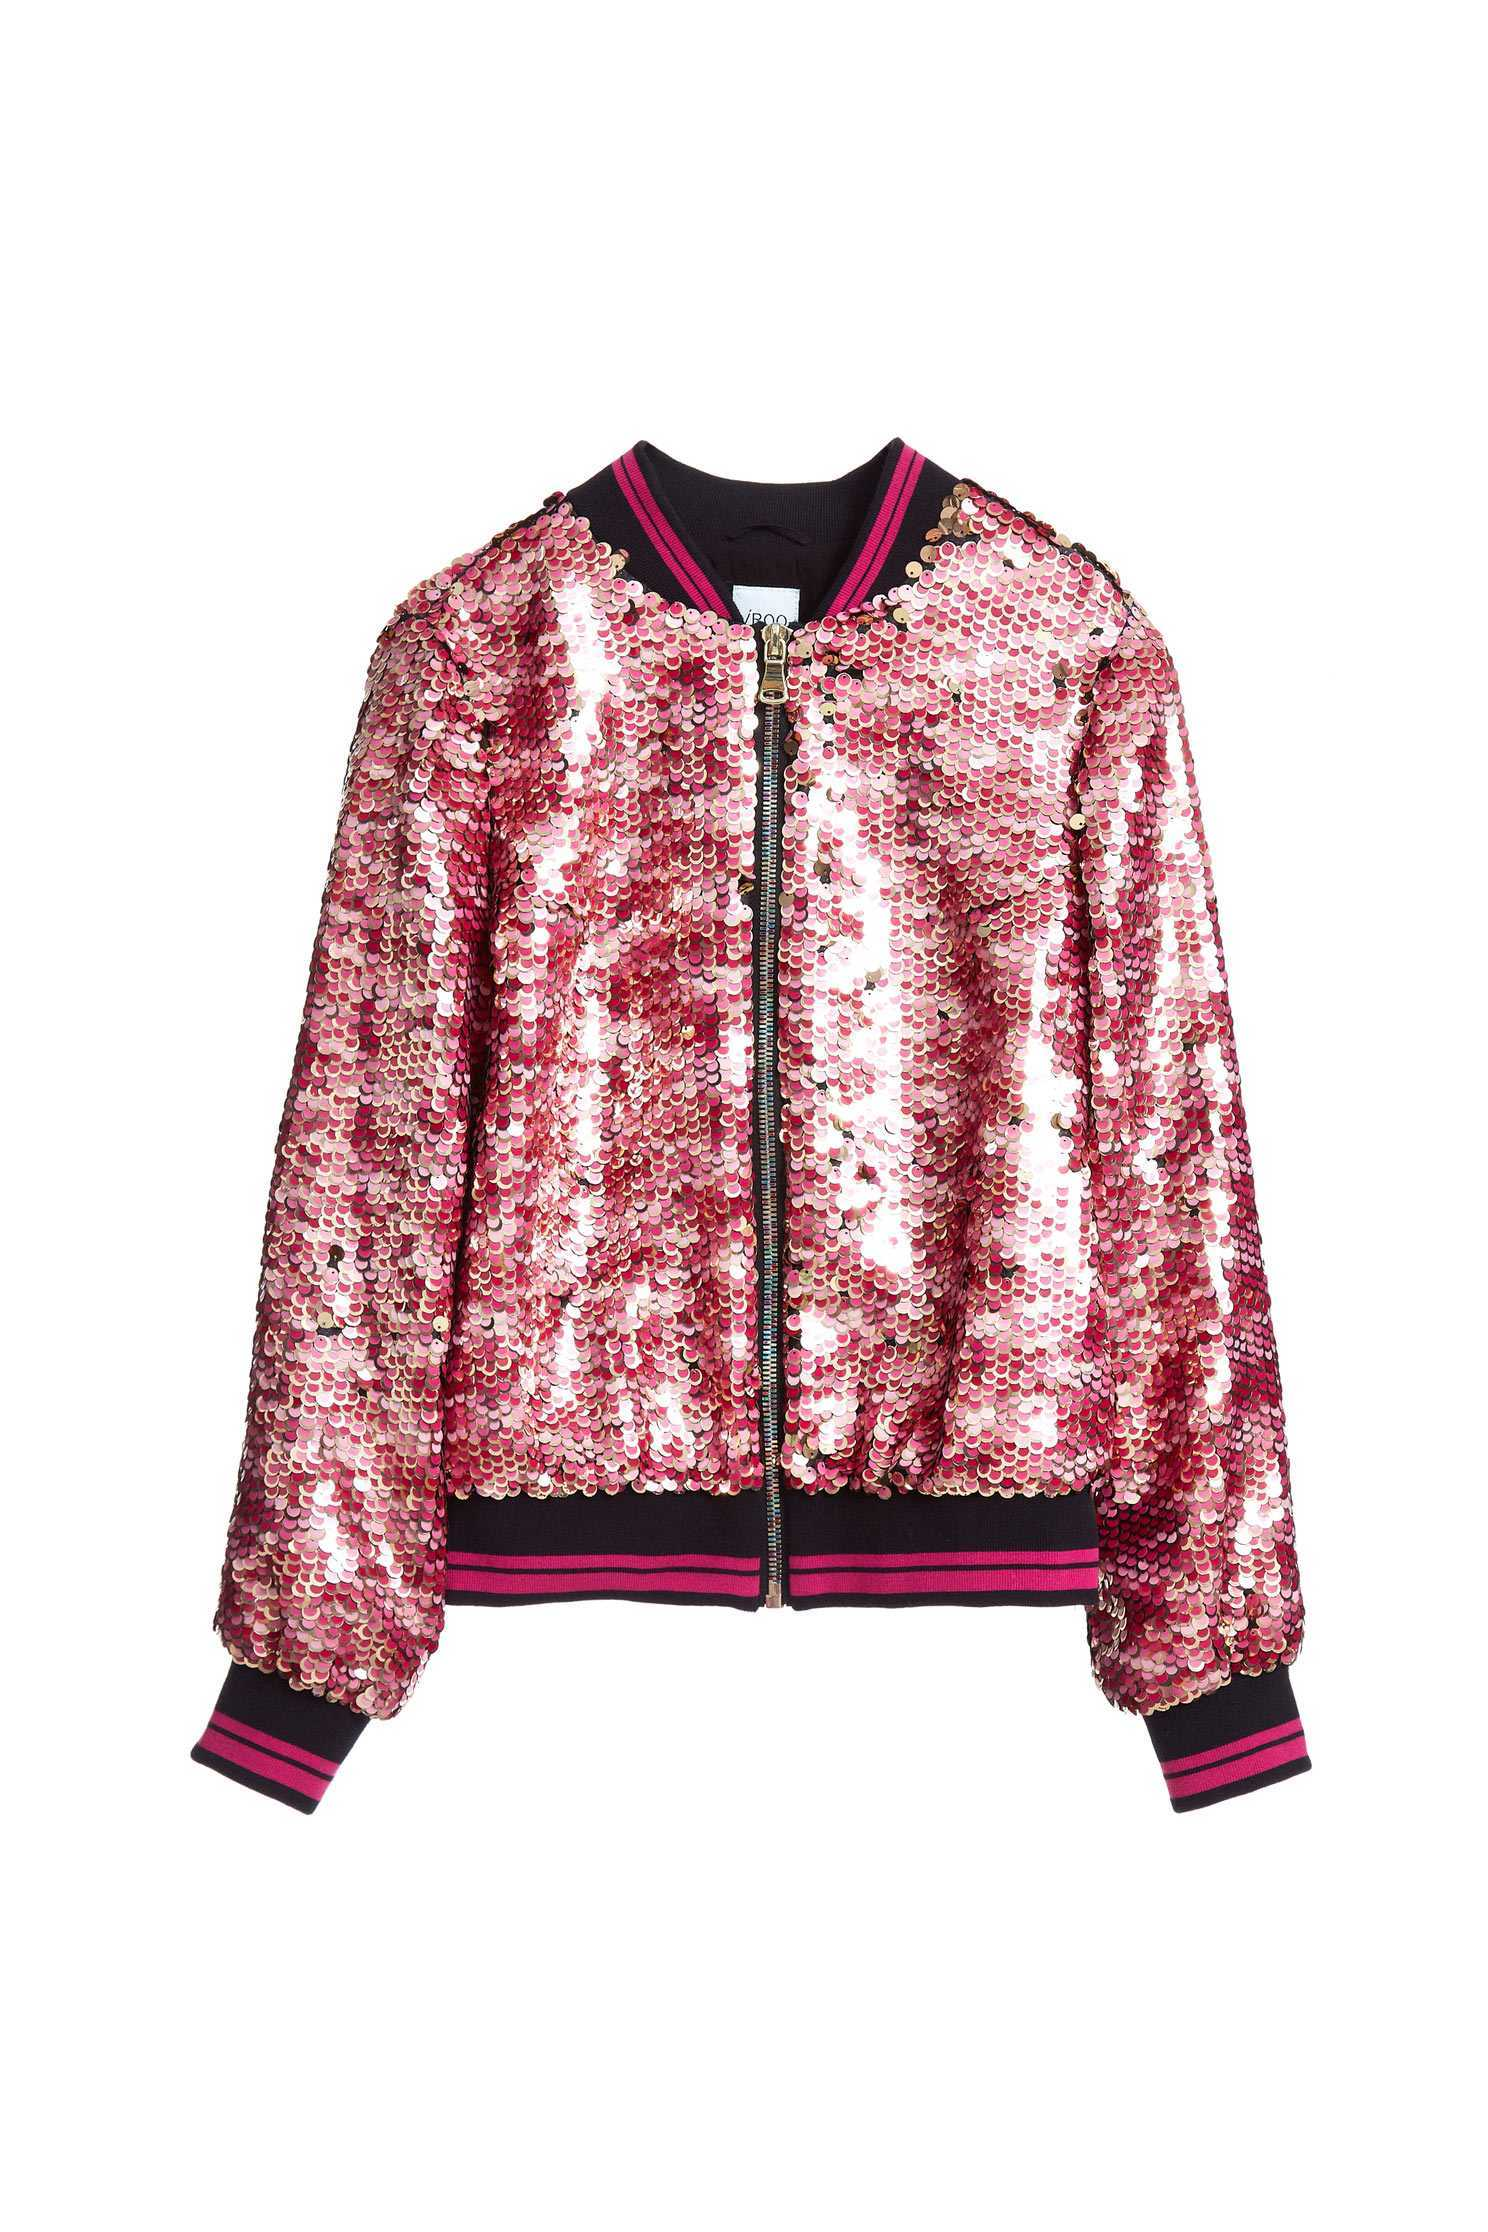 Full sequins coat